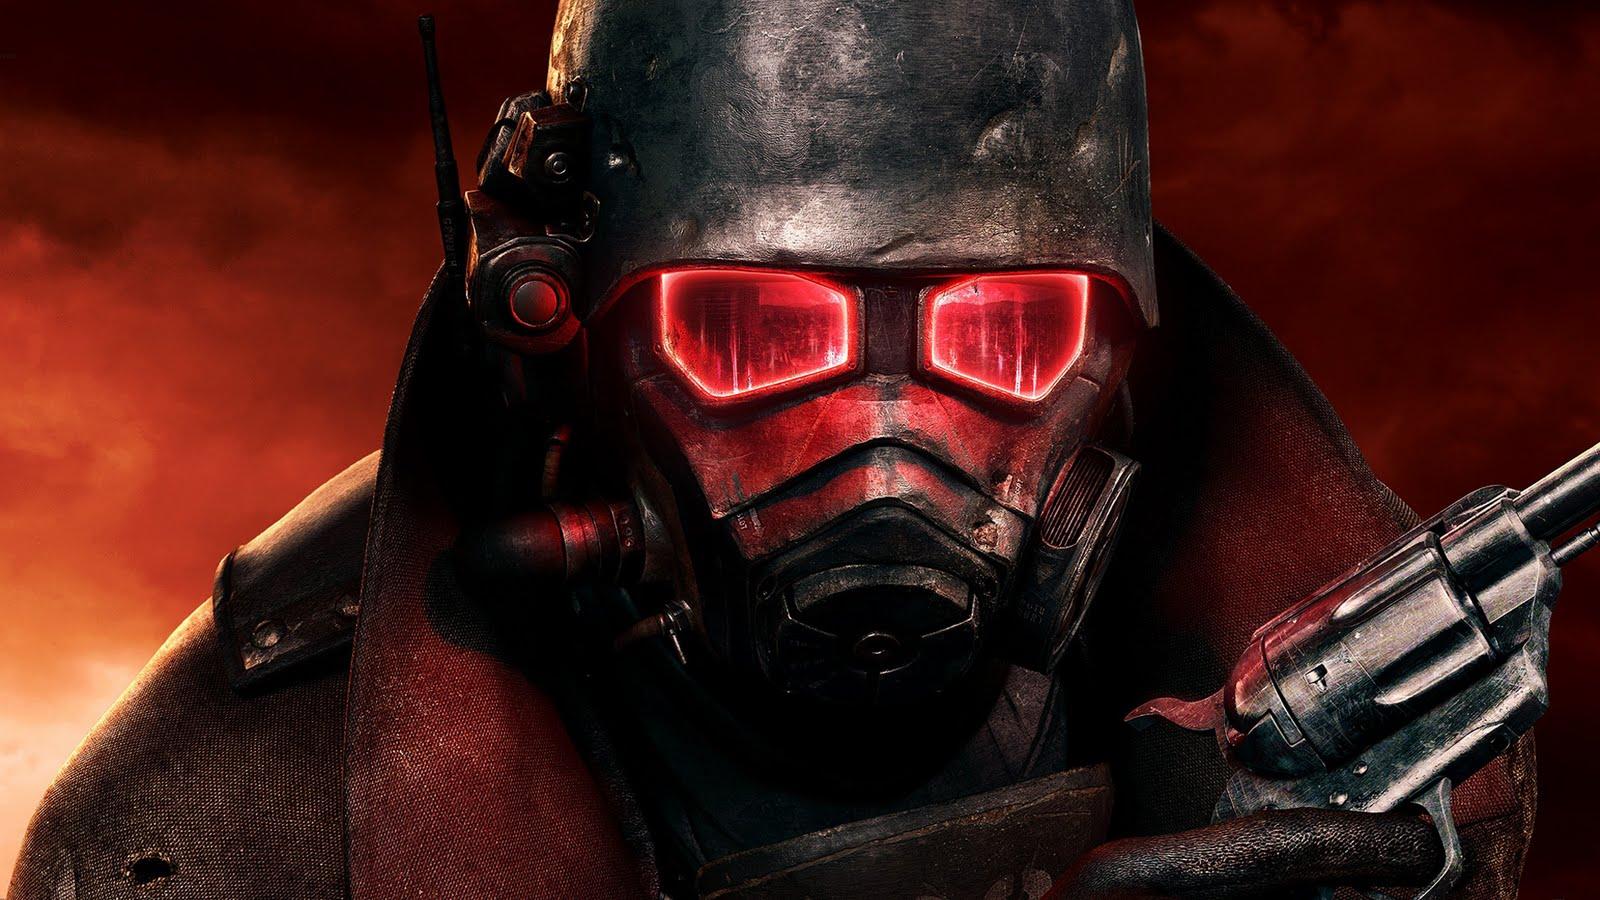 http://1.bp.blogspot.com/-ydB0-S8fPz0/TdK2dsZqYWI/AAAAAAAABvM/pgW0vOvWRjo/s1600/Fallout_new_vegas.jpg